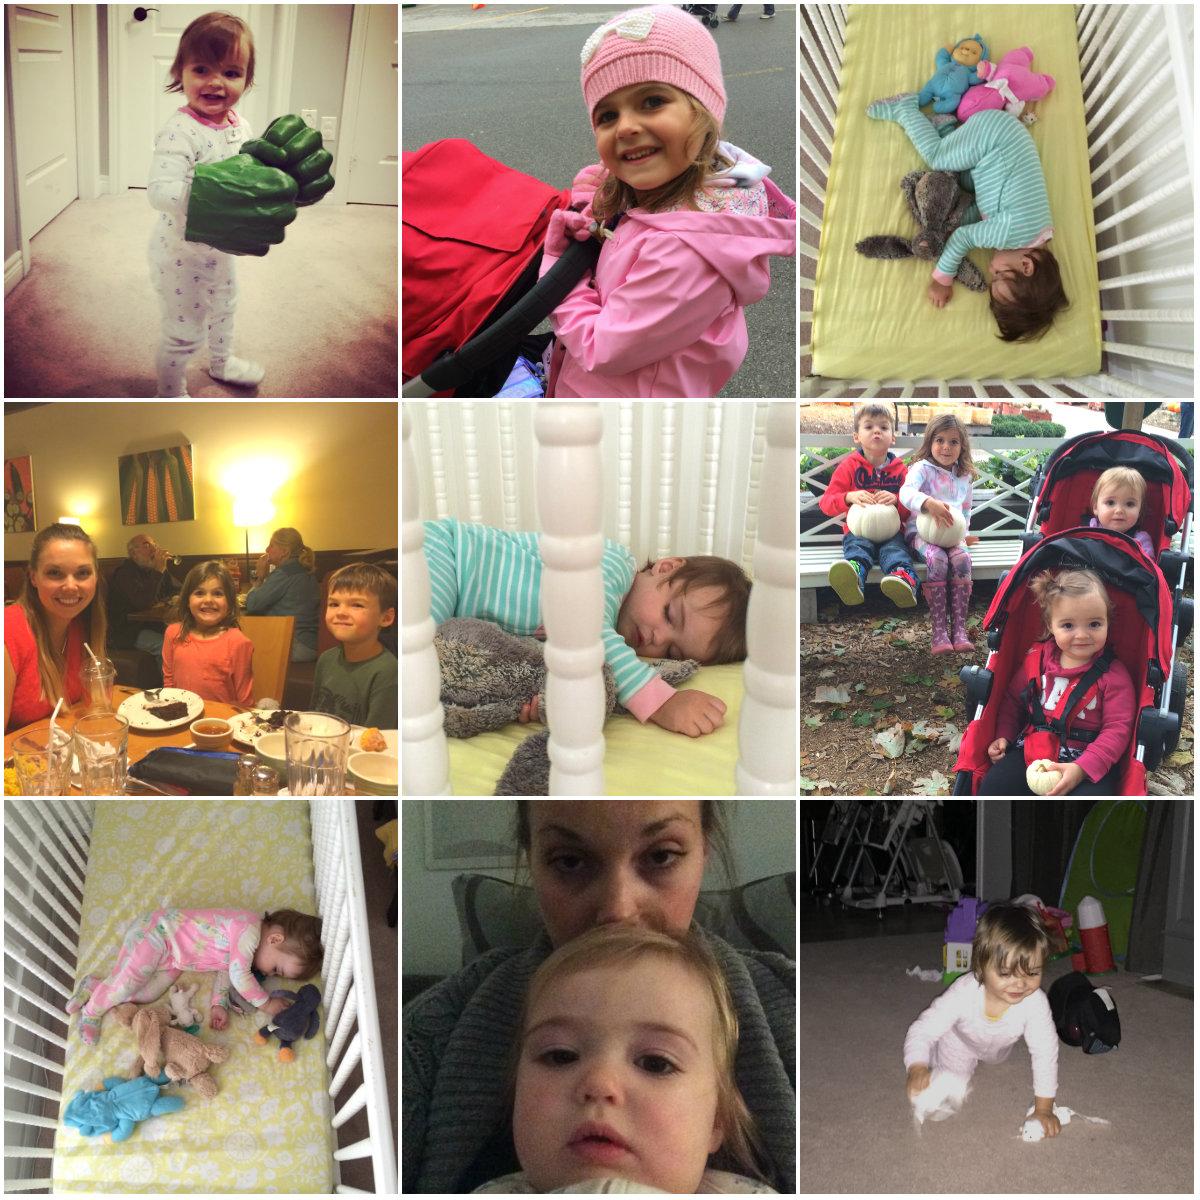 Illness and four kids